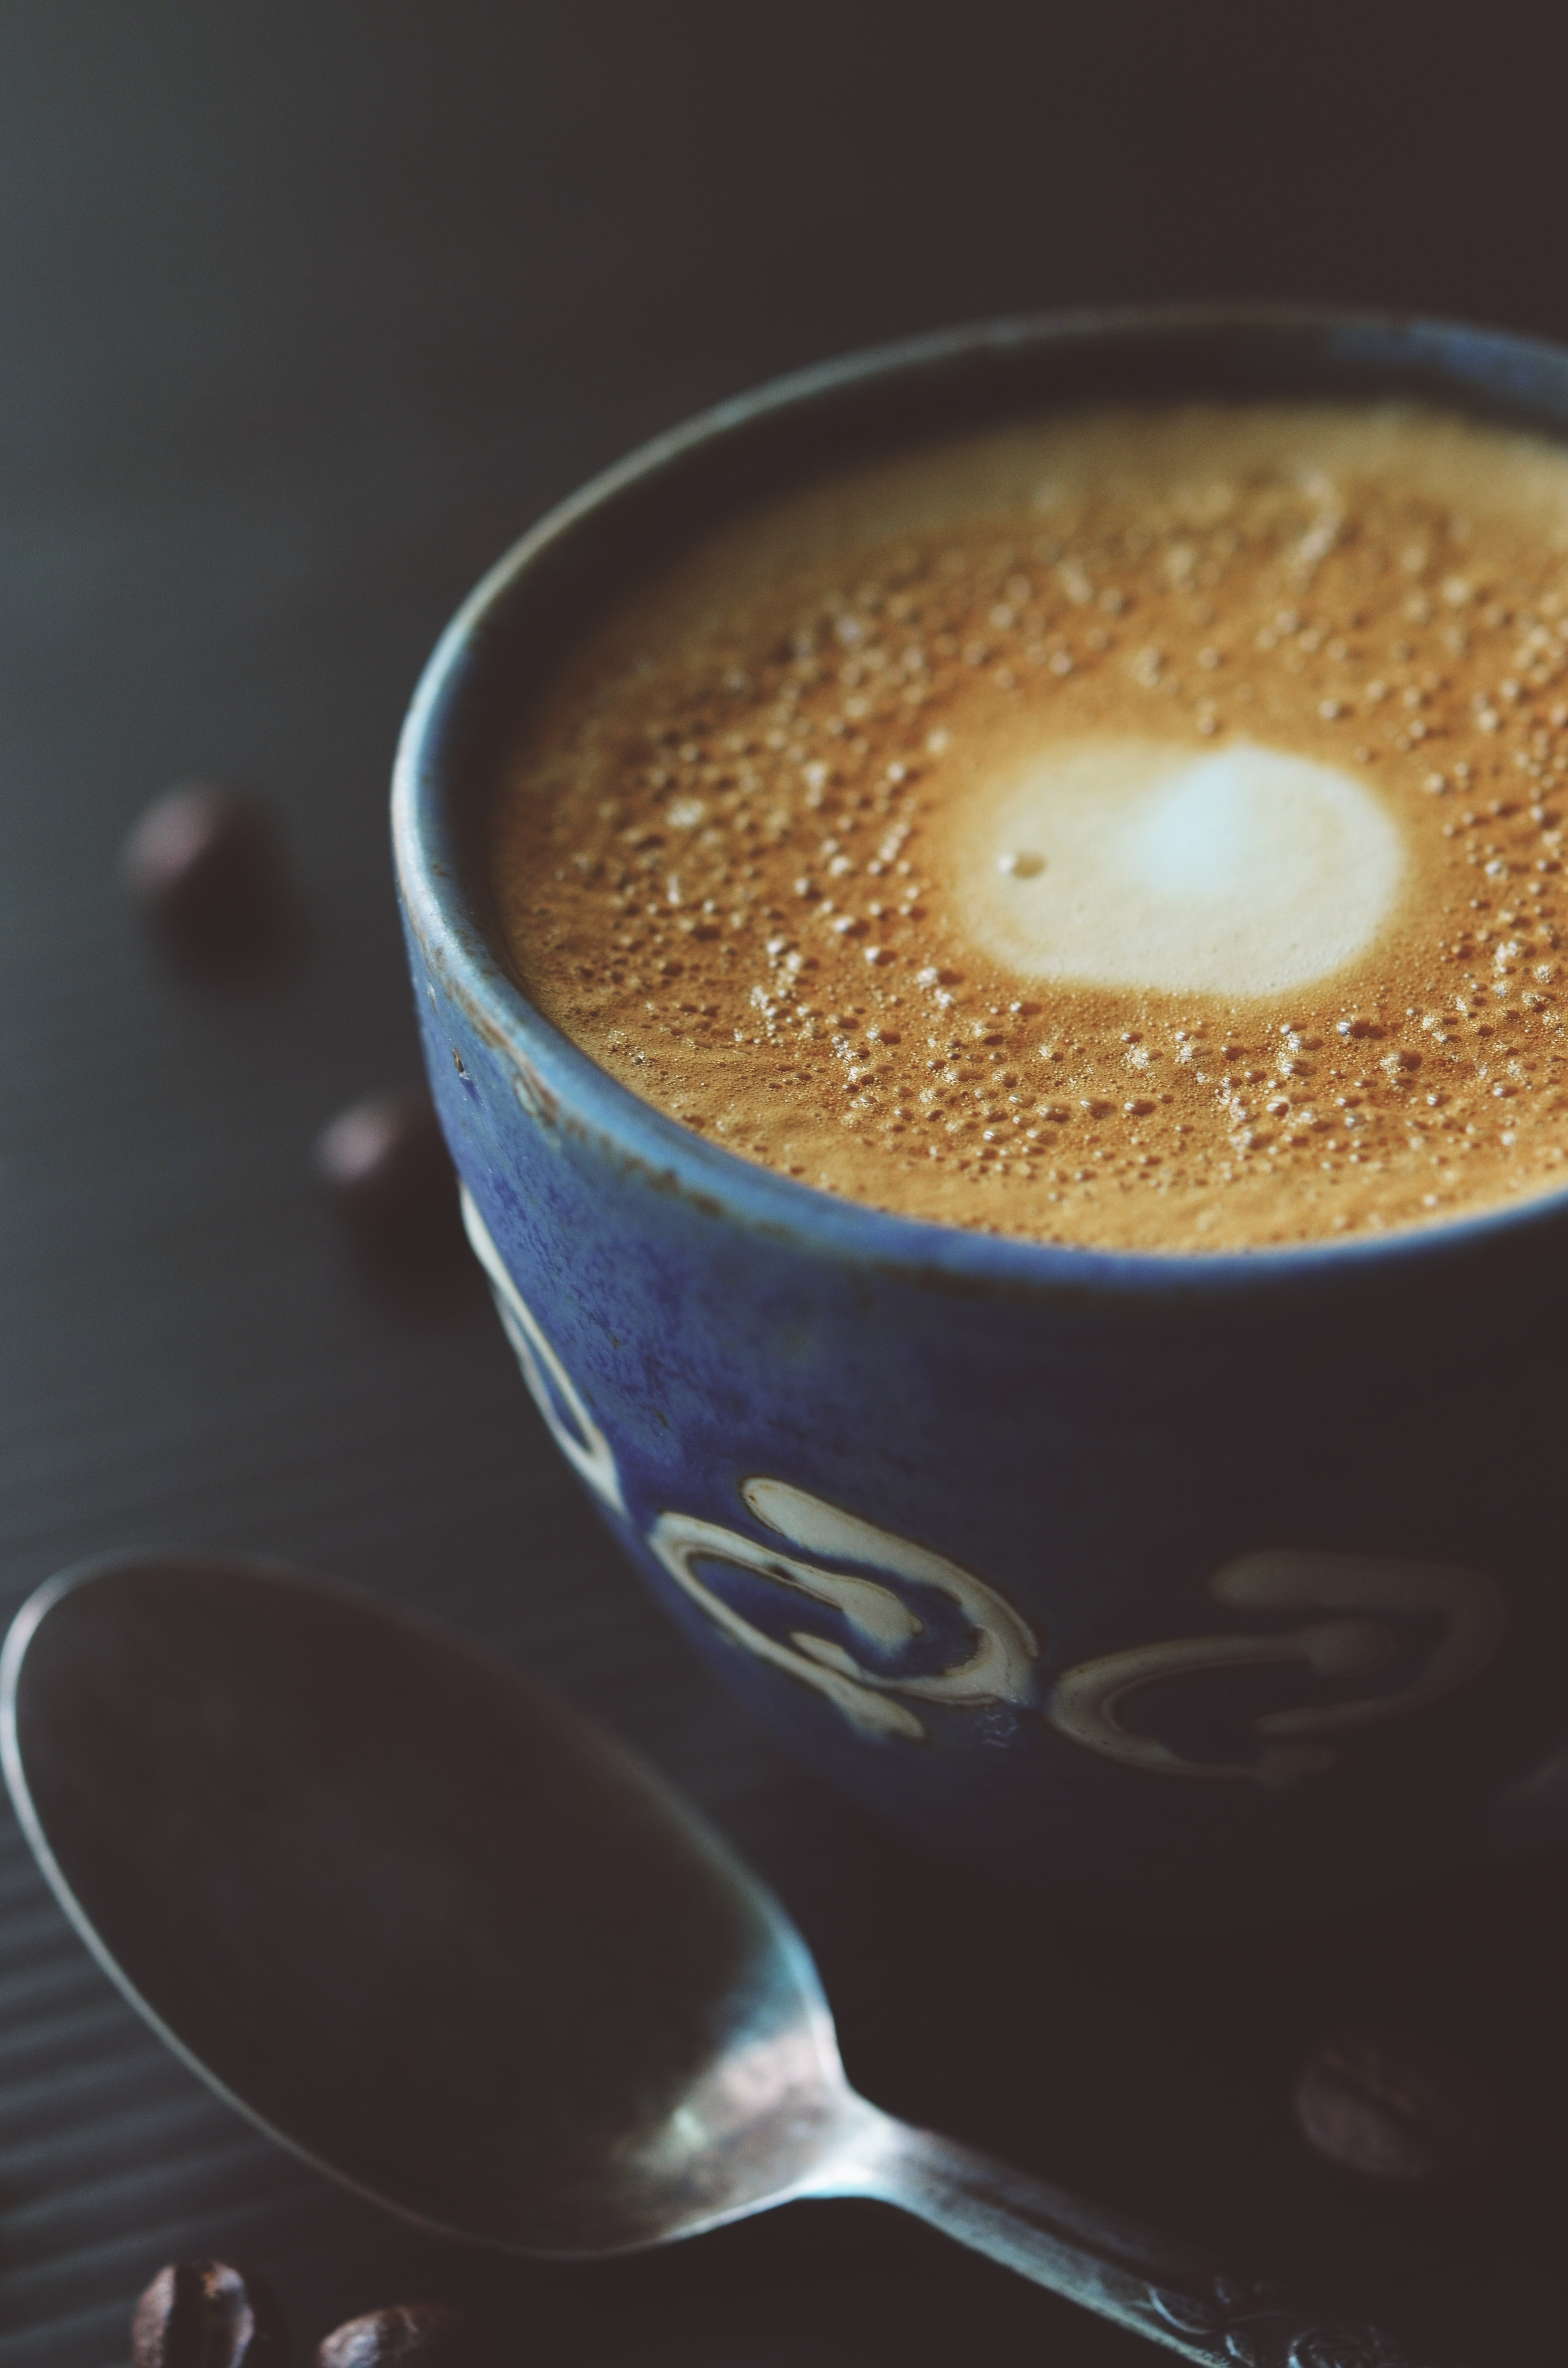 Cappuccino In Ceramic Teacup Beside Teaspoon 183 Free Stock